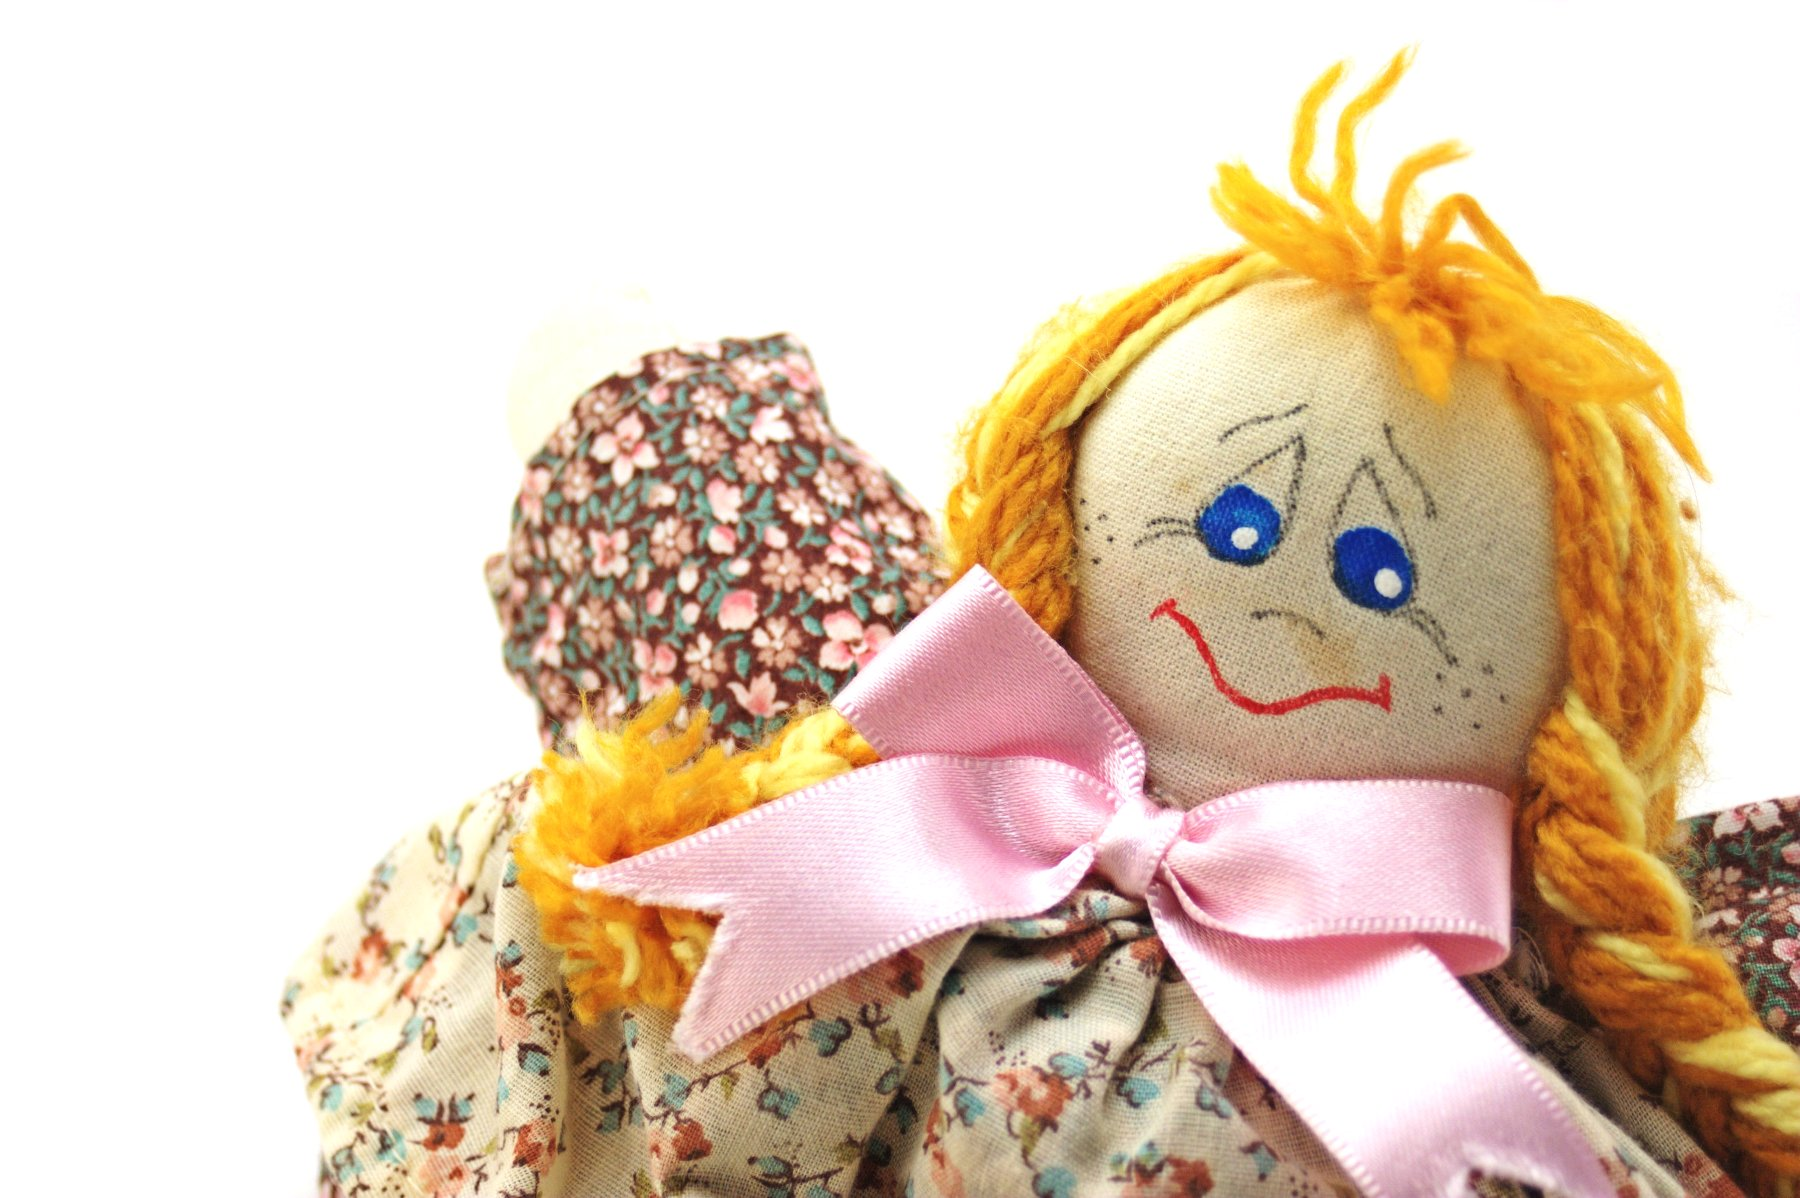 Fashion handmade doll, Art, One, Hat, Head, HQ Photo